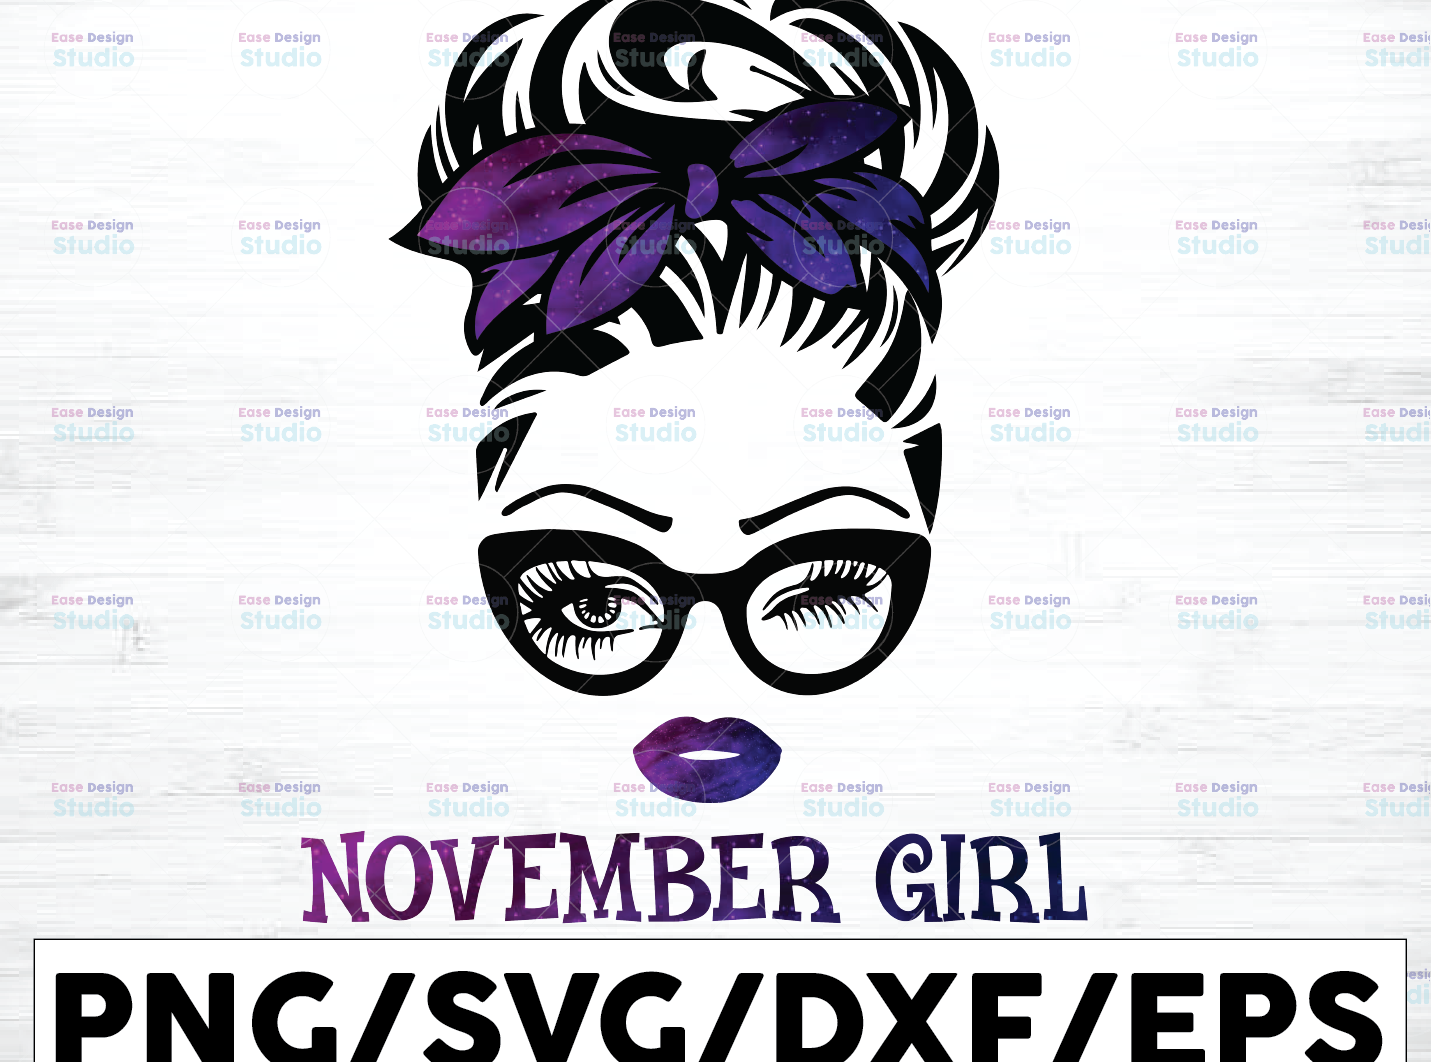 November Girl png, Messy Bun Birthday Png, Face Eys png, Winked Eye png, - WTMETSY16122020 01 73 -